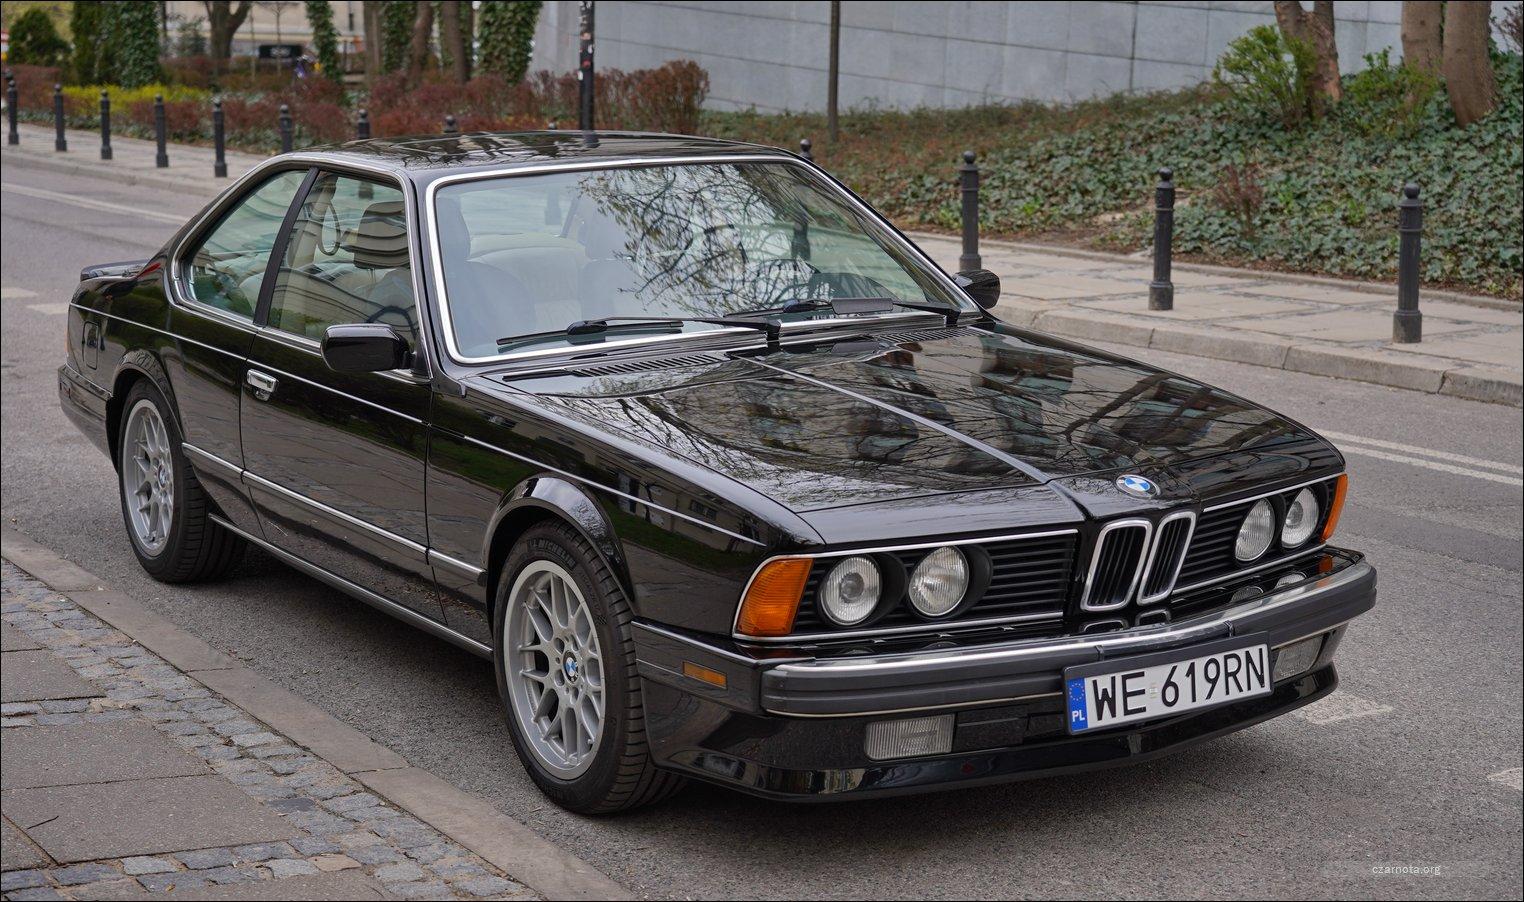 Classic BMW 6 series E24